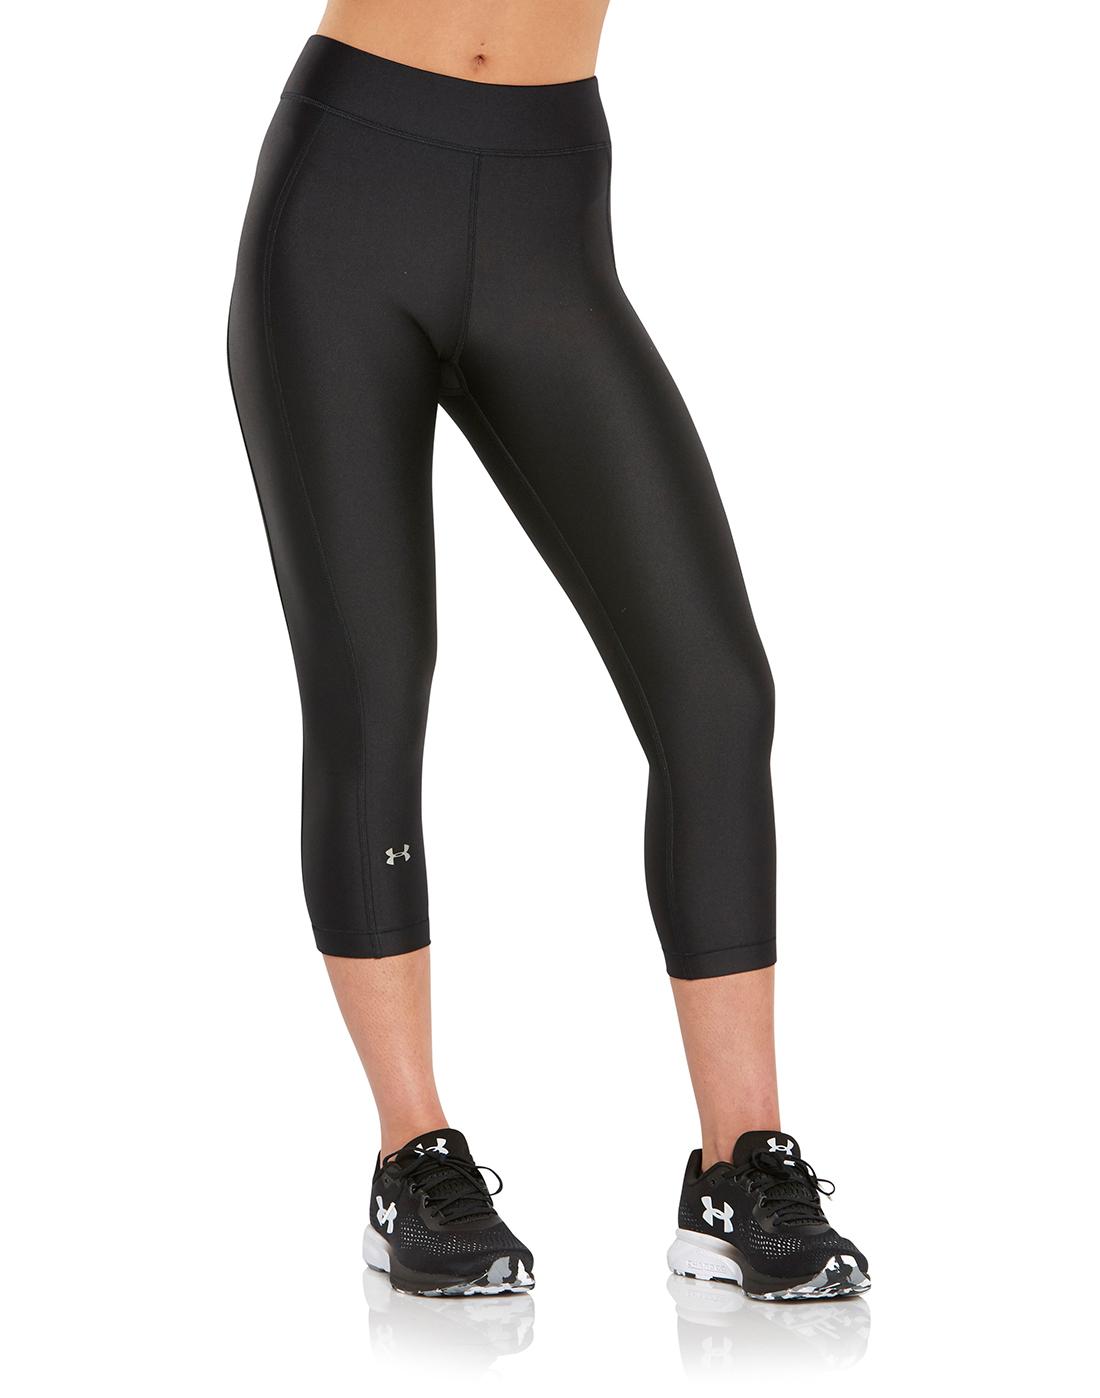 the best attitude 9e7b4 0acf1 Under Armour. Womens Heatgear Capri Leggings. Womens Heatgear Capri  Leggings ...